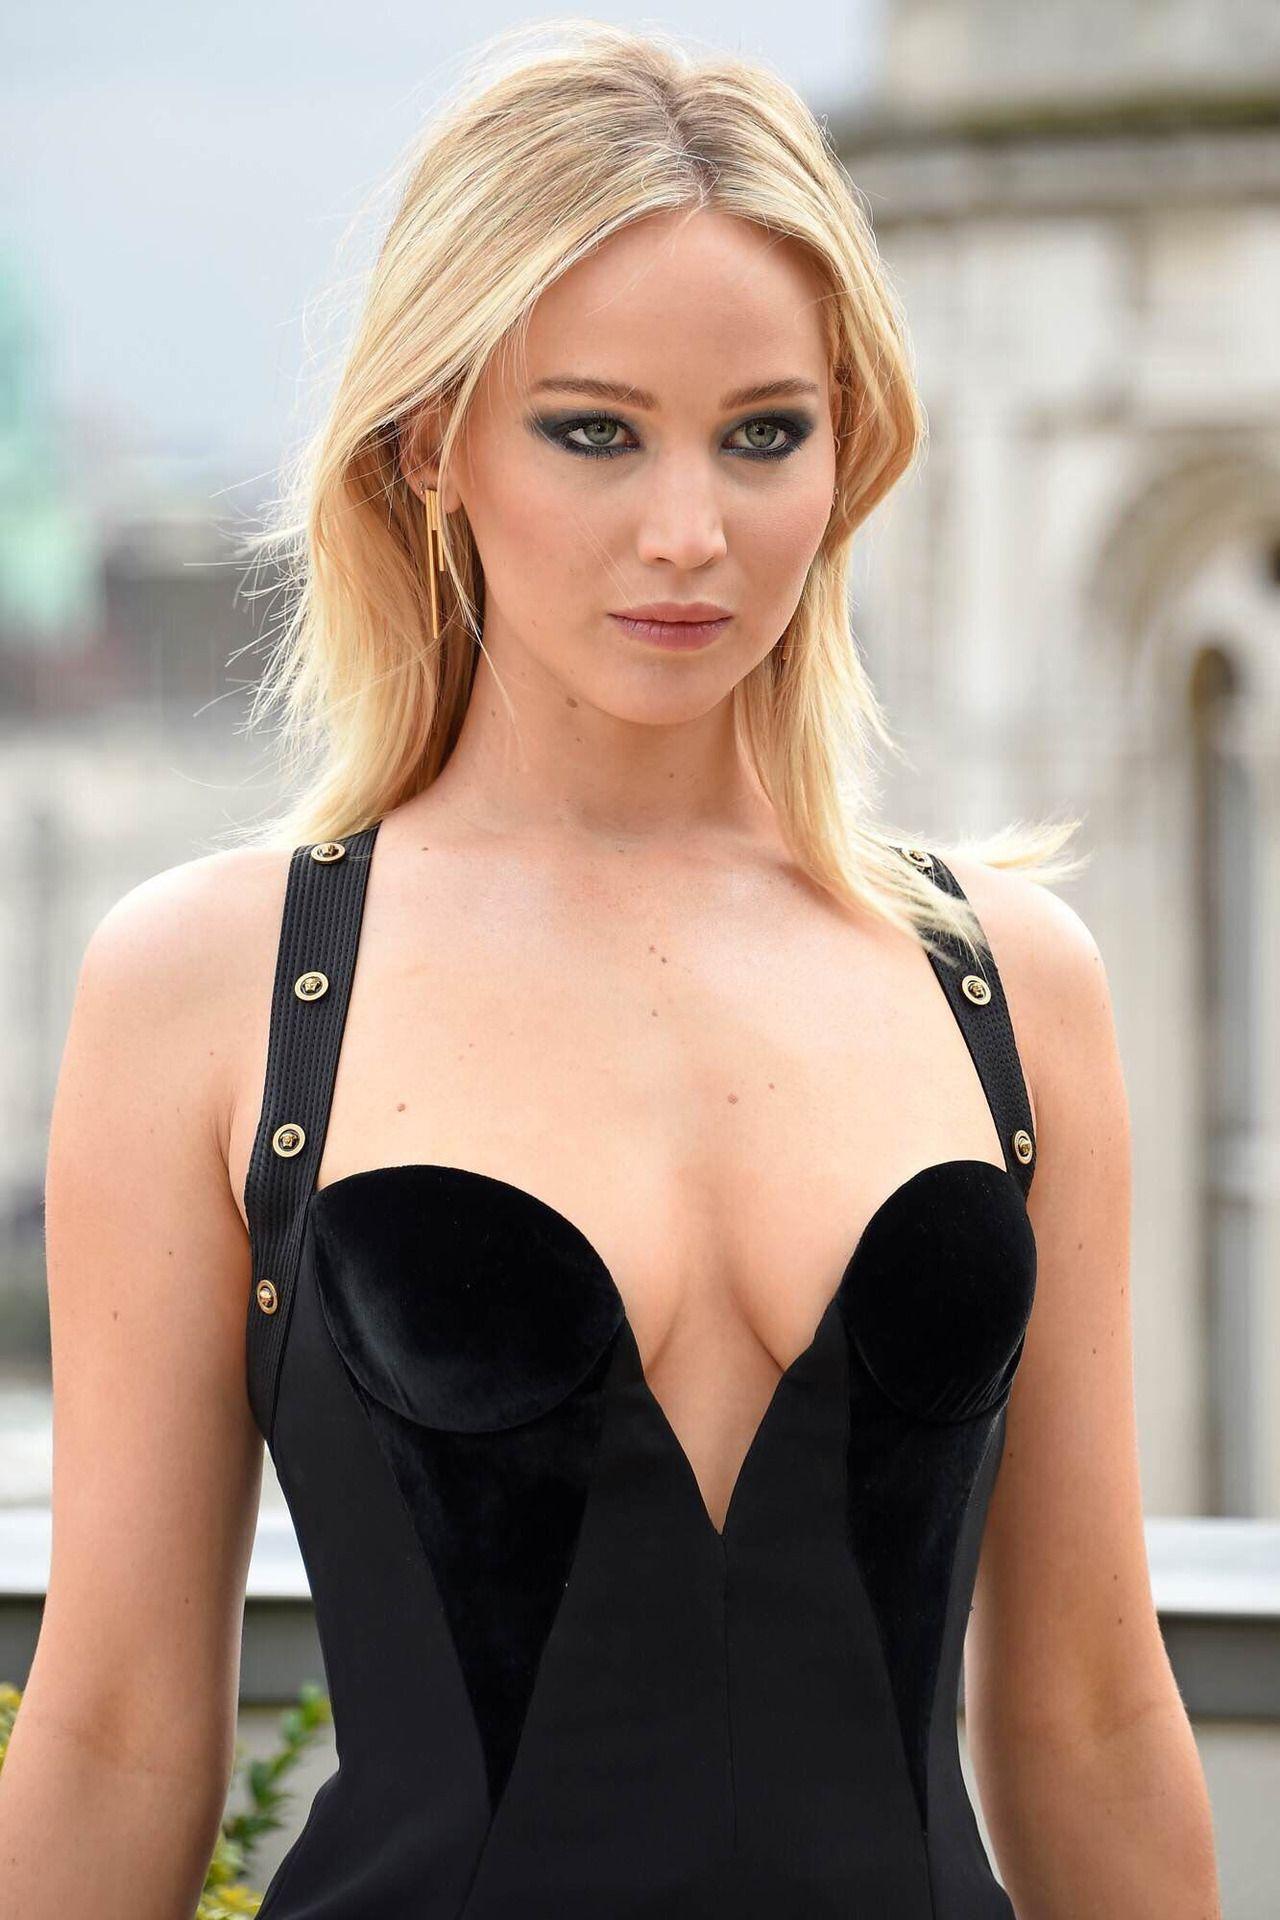 Actriz Porno Guiness World Record 256 best jennifer la images in 2020 | jennifer, celebs